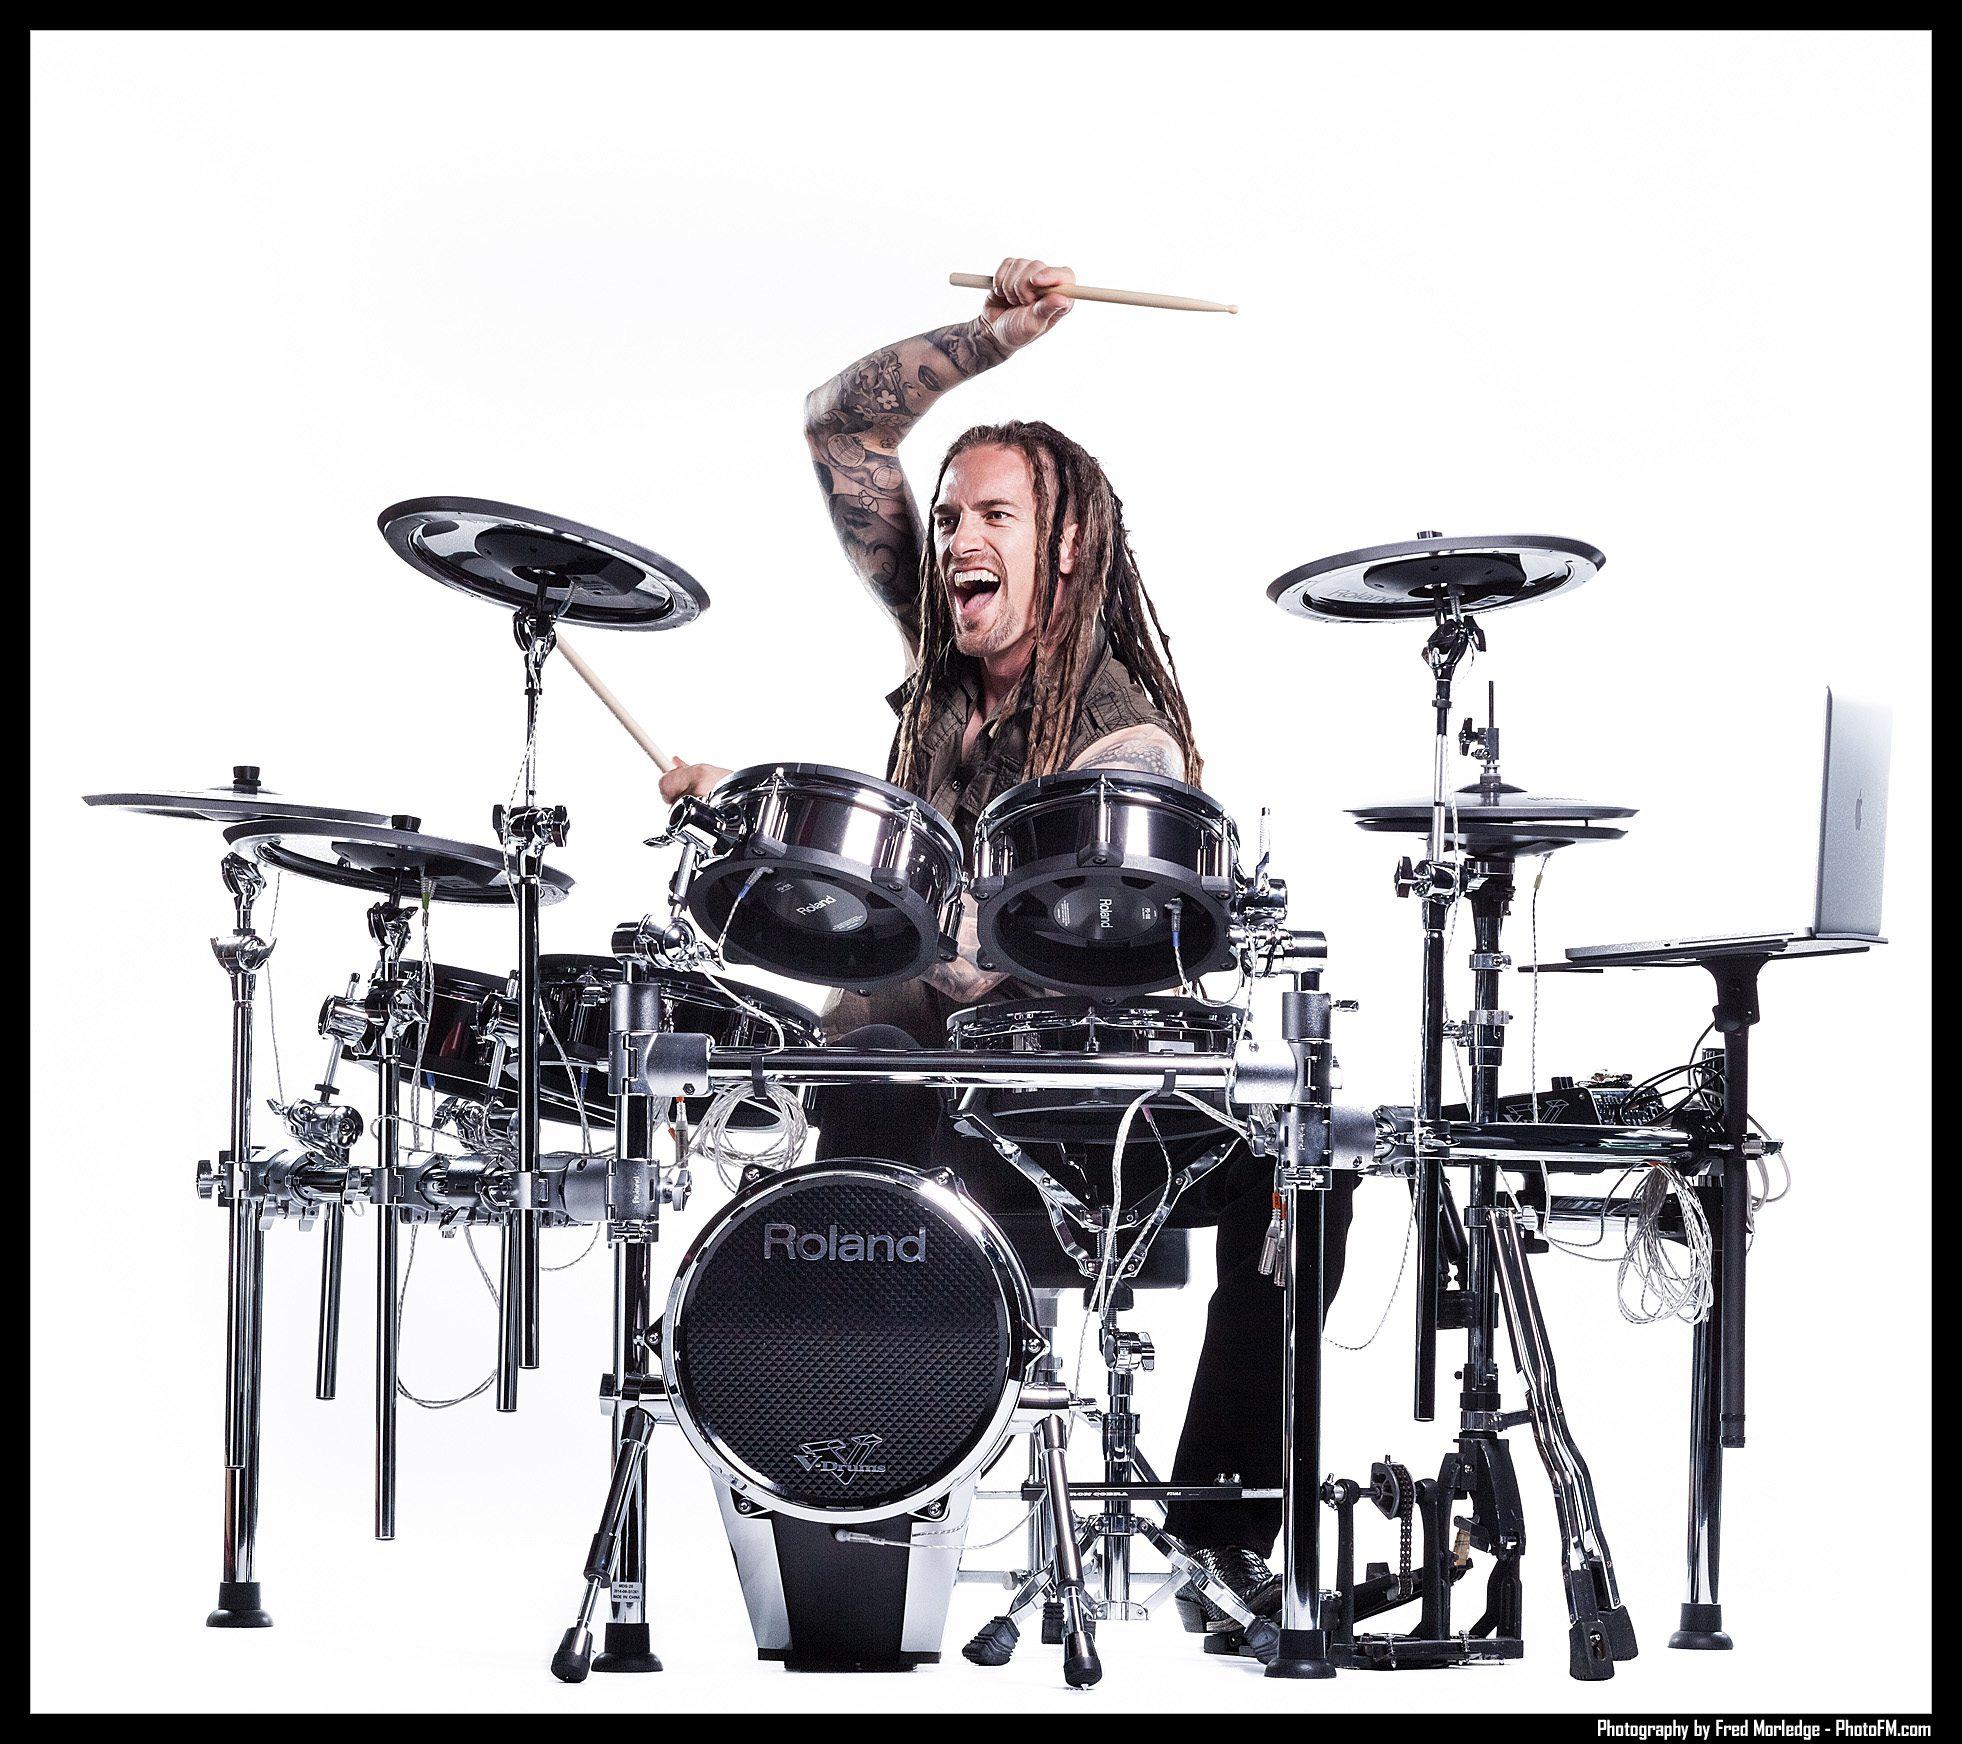 nick oshirocom professional online session drummer professional online studio drummer online drum